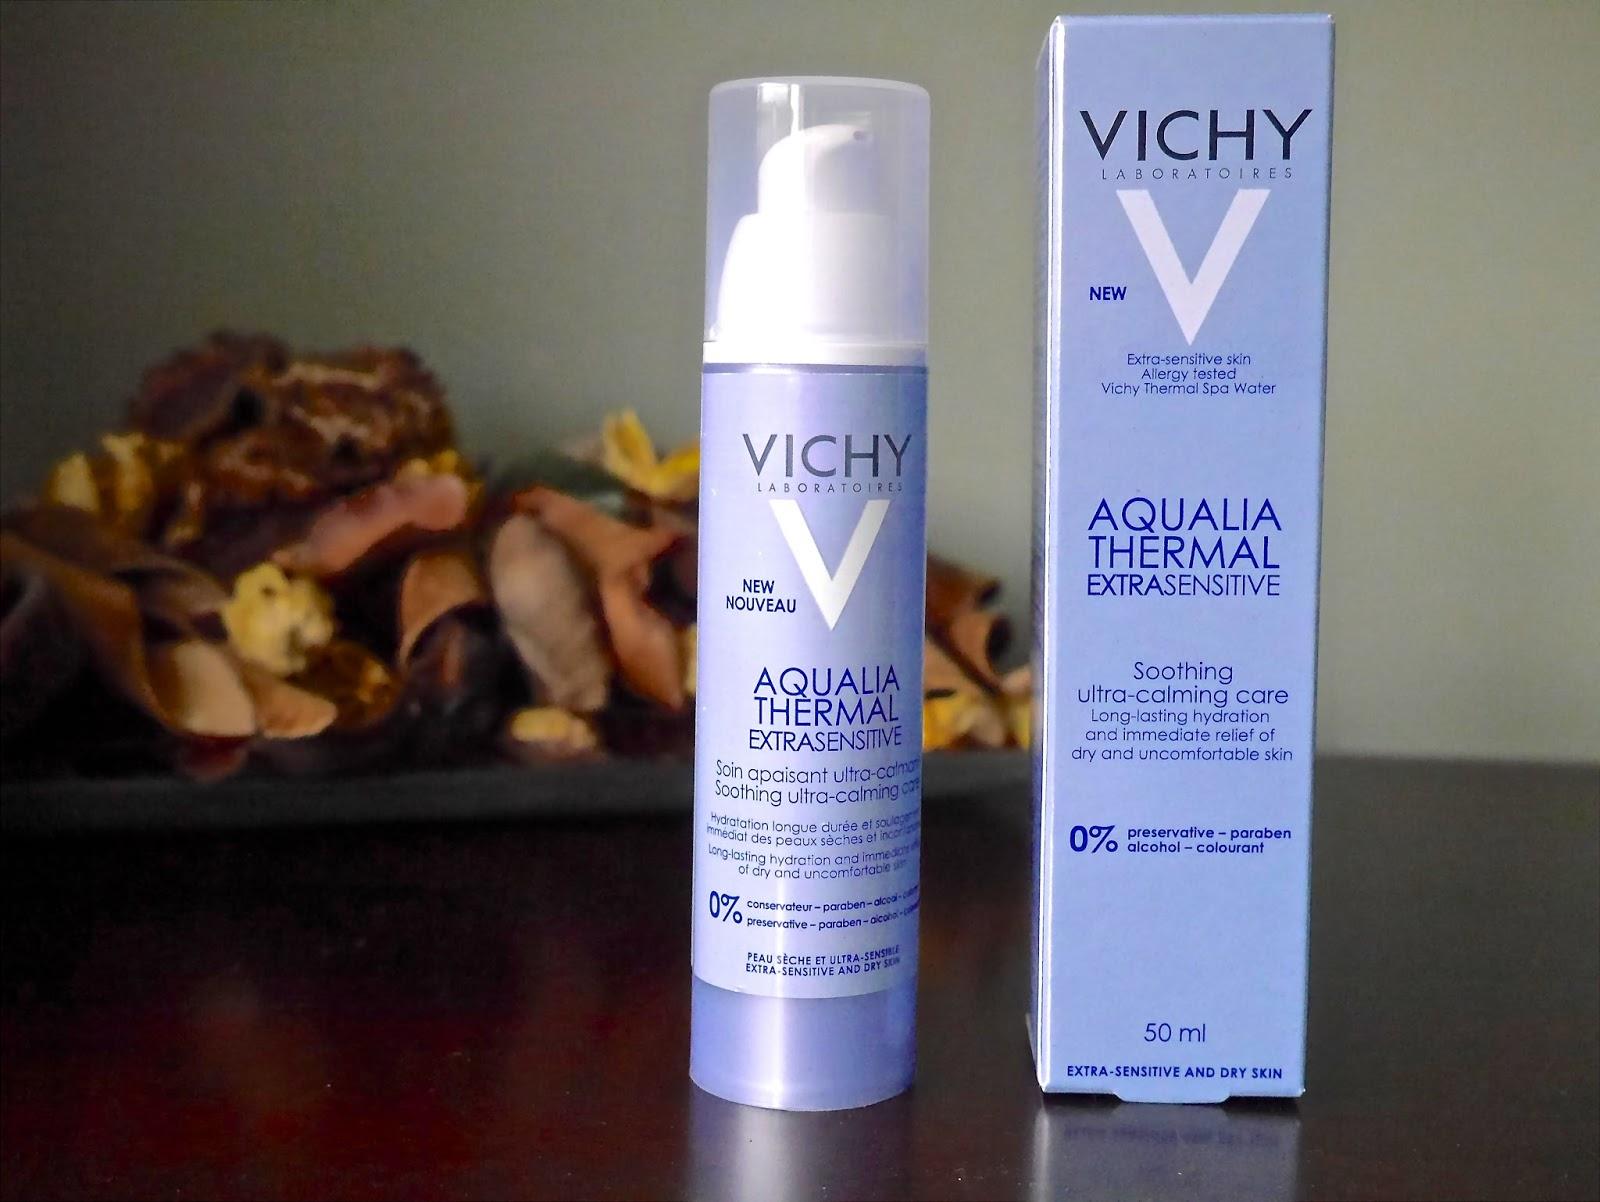 vichy aqualia thermal extrasensitive for sensitive skin. Black Bedroom Furniture Sets. Home Design Ideas